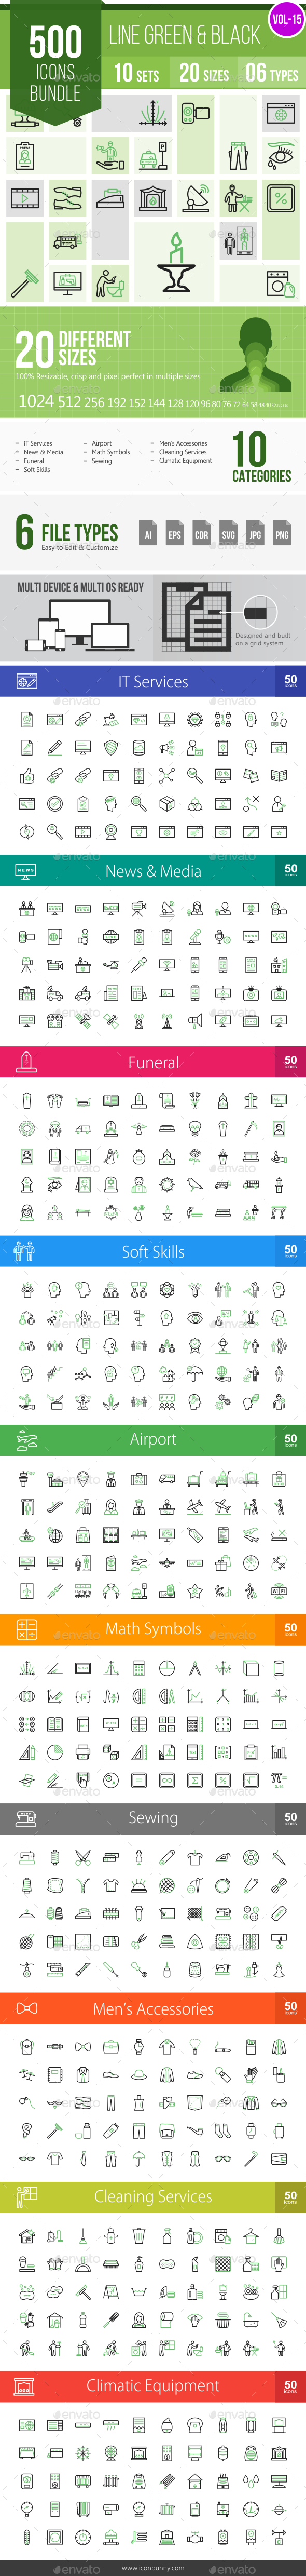 500 Vector Green & Black Line Icons Bundle (Vol-15) - Icons